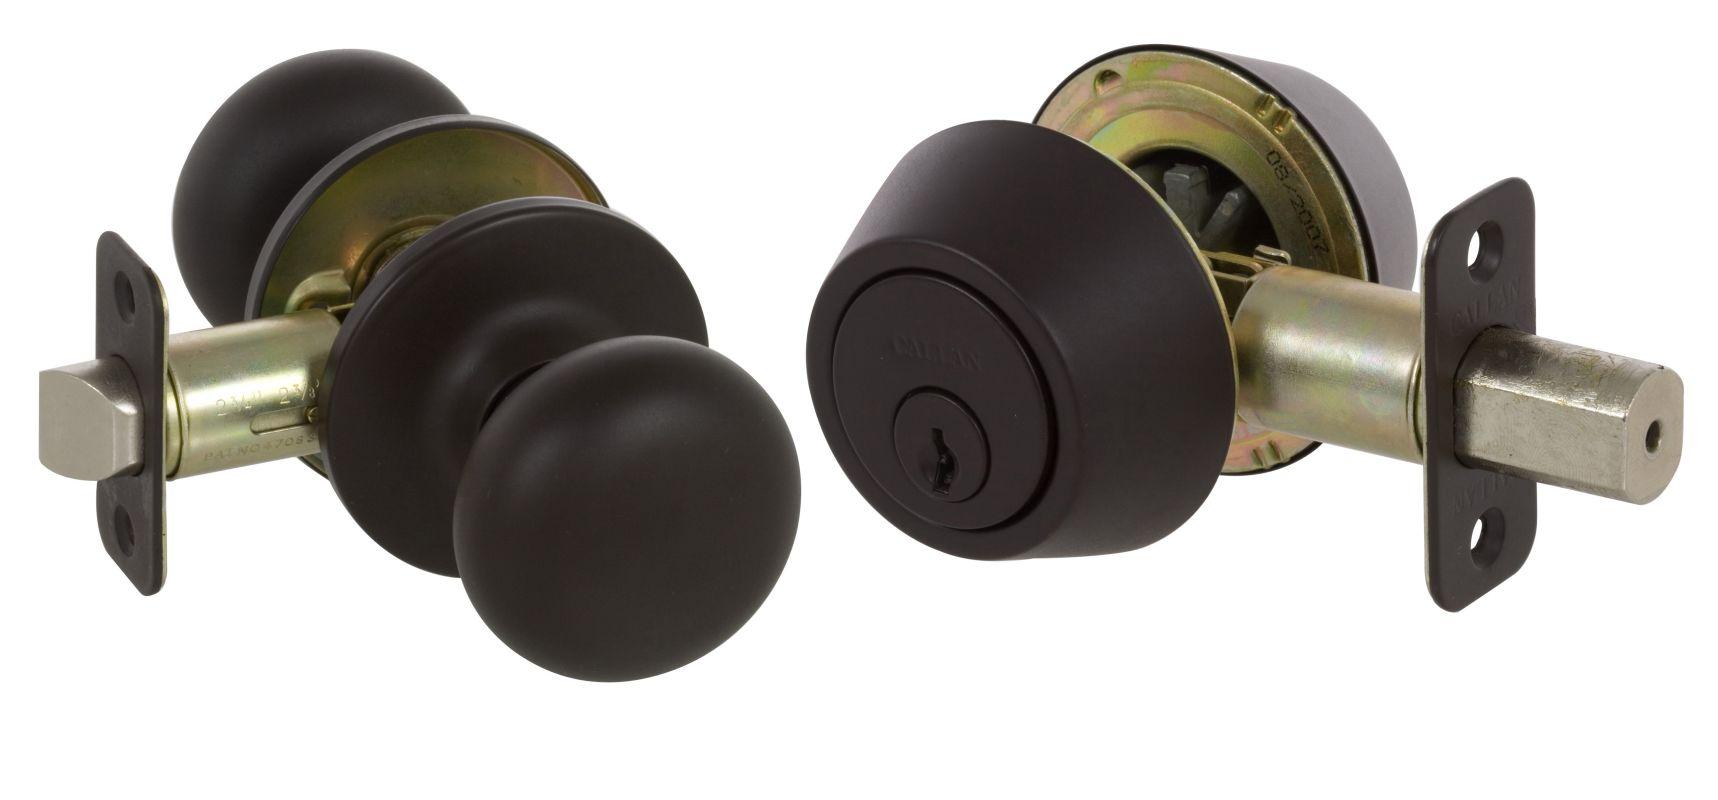 Callan Ks3000 Oil Rubbed Bronze Saxon Series Grade 3 Keyed